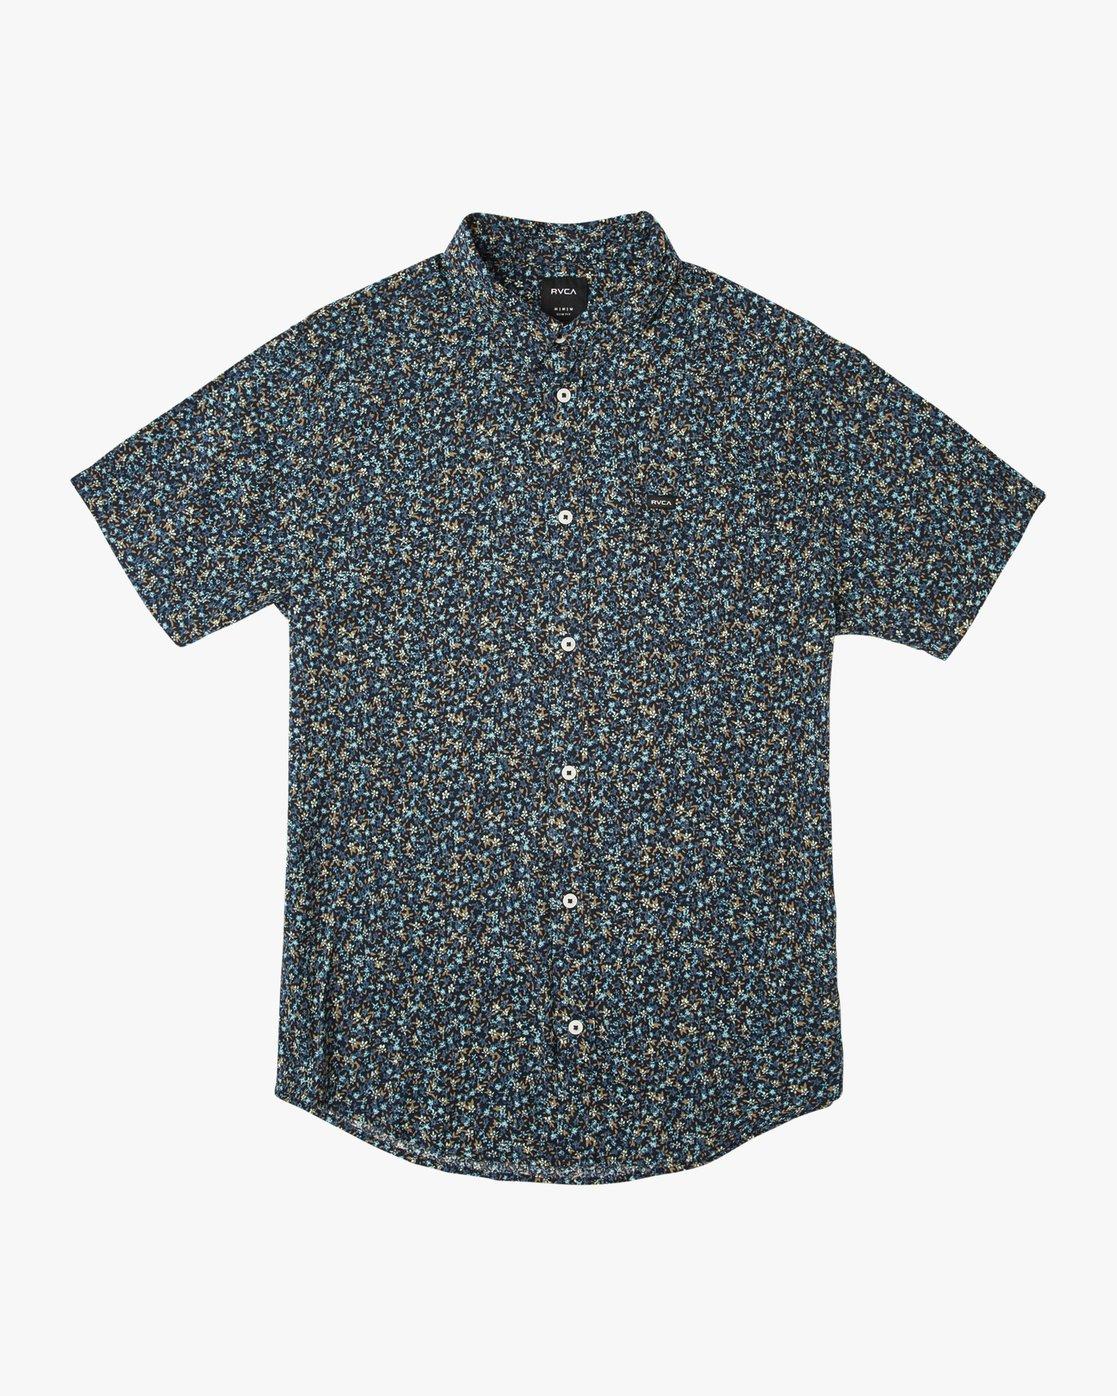 0 Boy's Revivalist Floral Button-Up Shirt Blue B556URRF RVCA